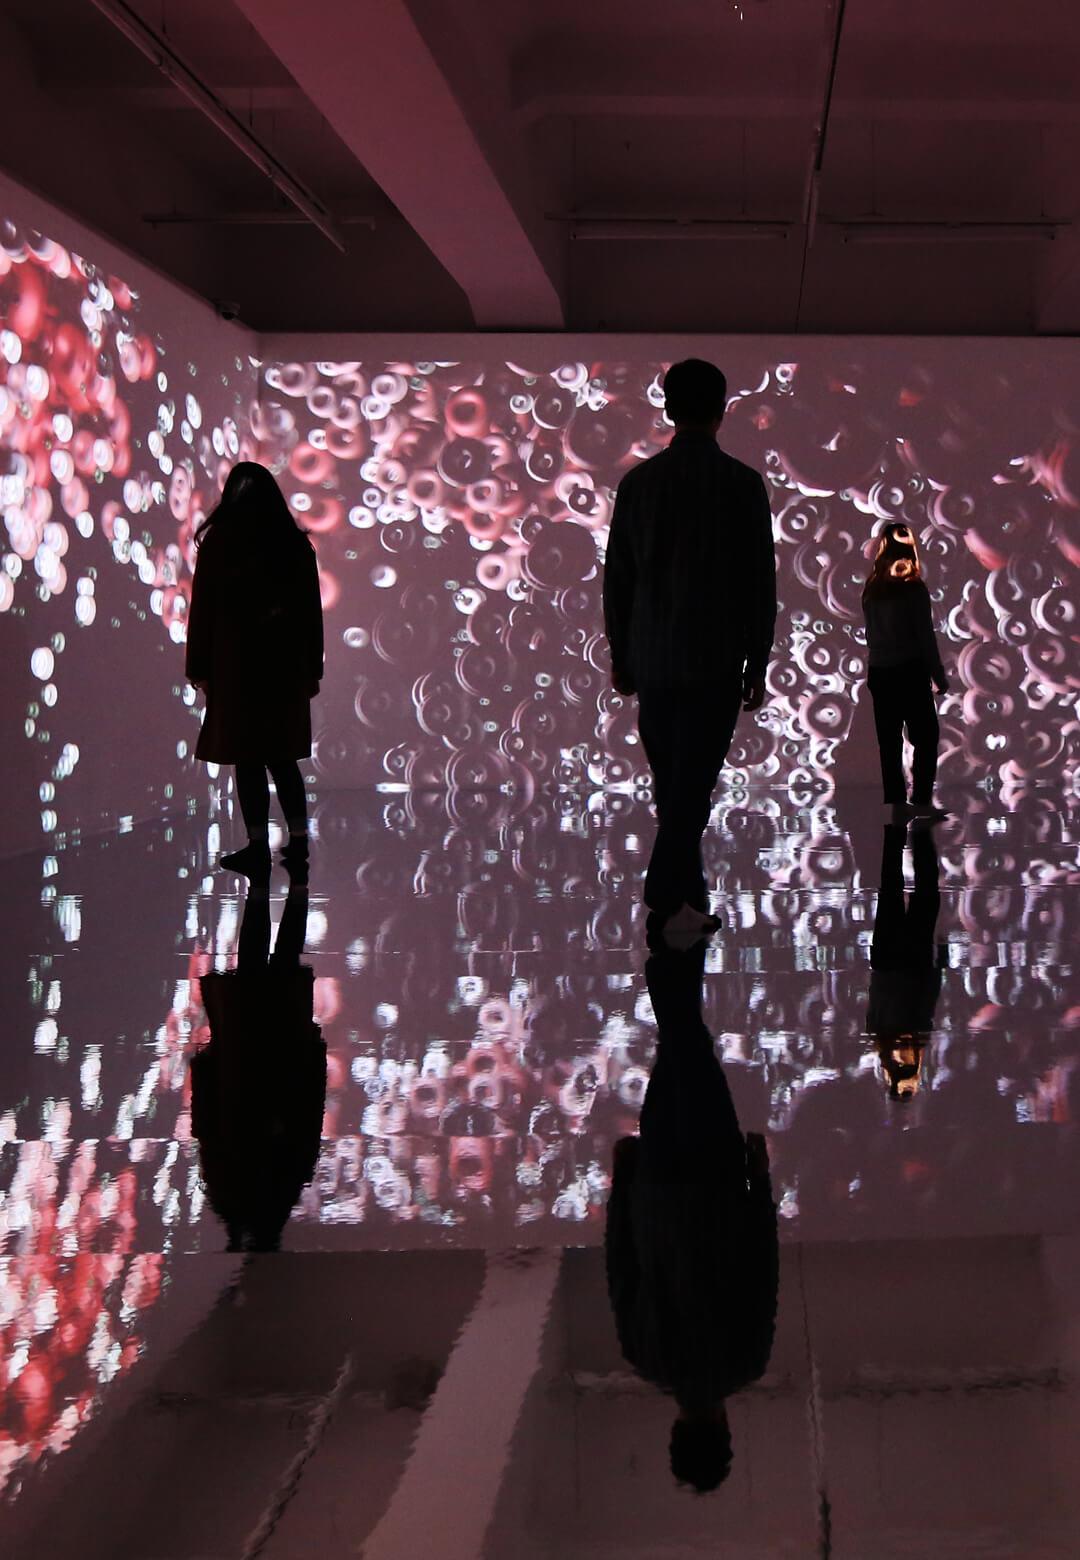 Yiyun Kang, Continuum, Installation Image 1| Continuum | Yiyun Kang | STIRworld